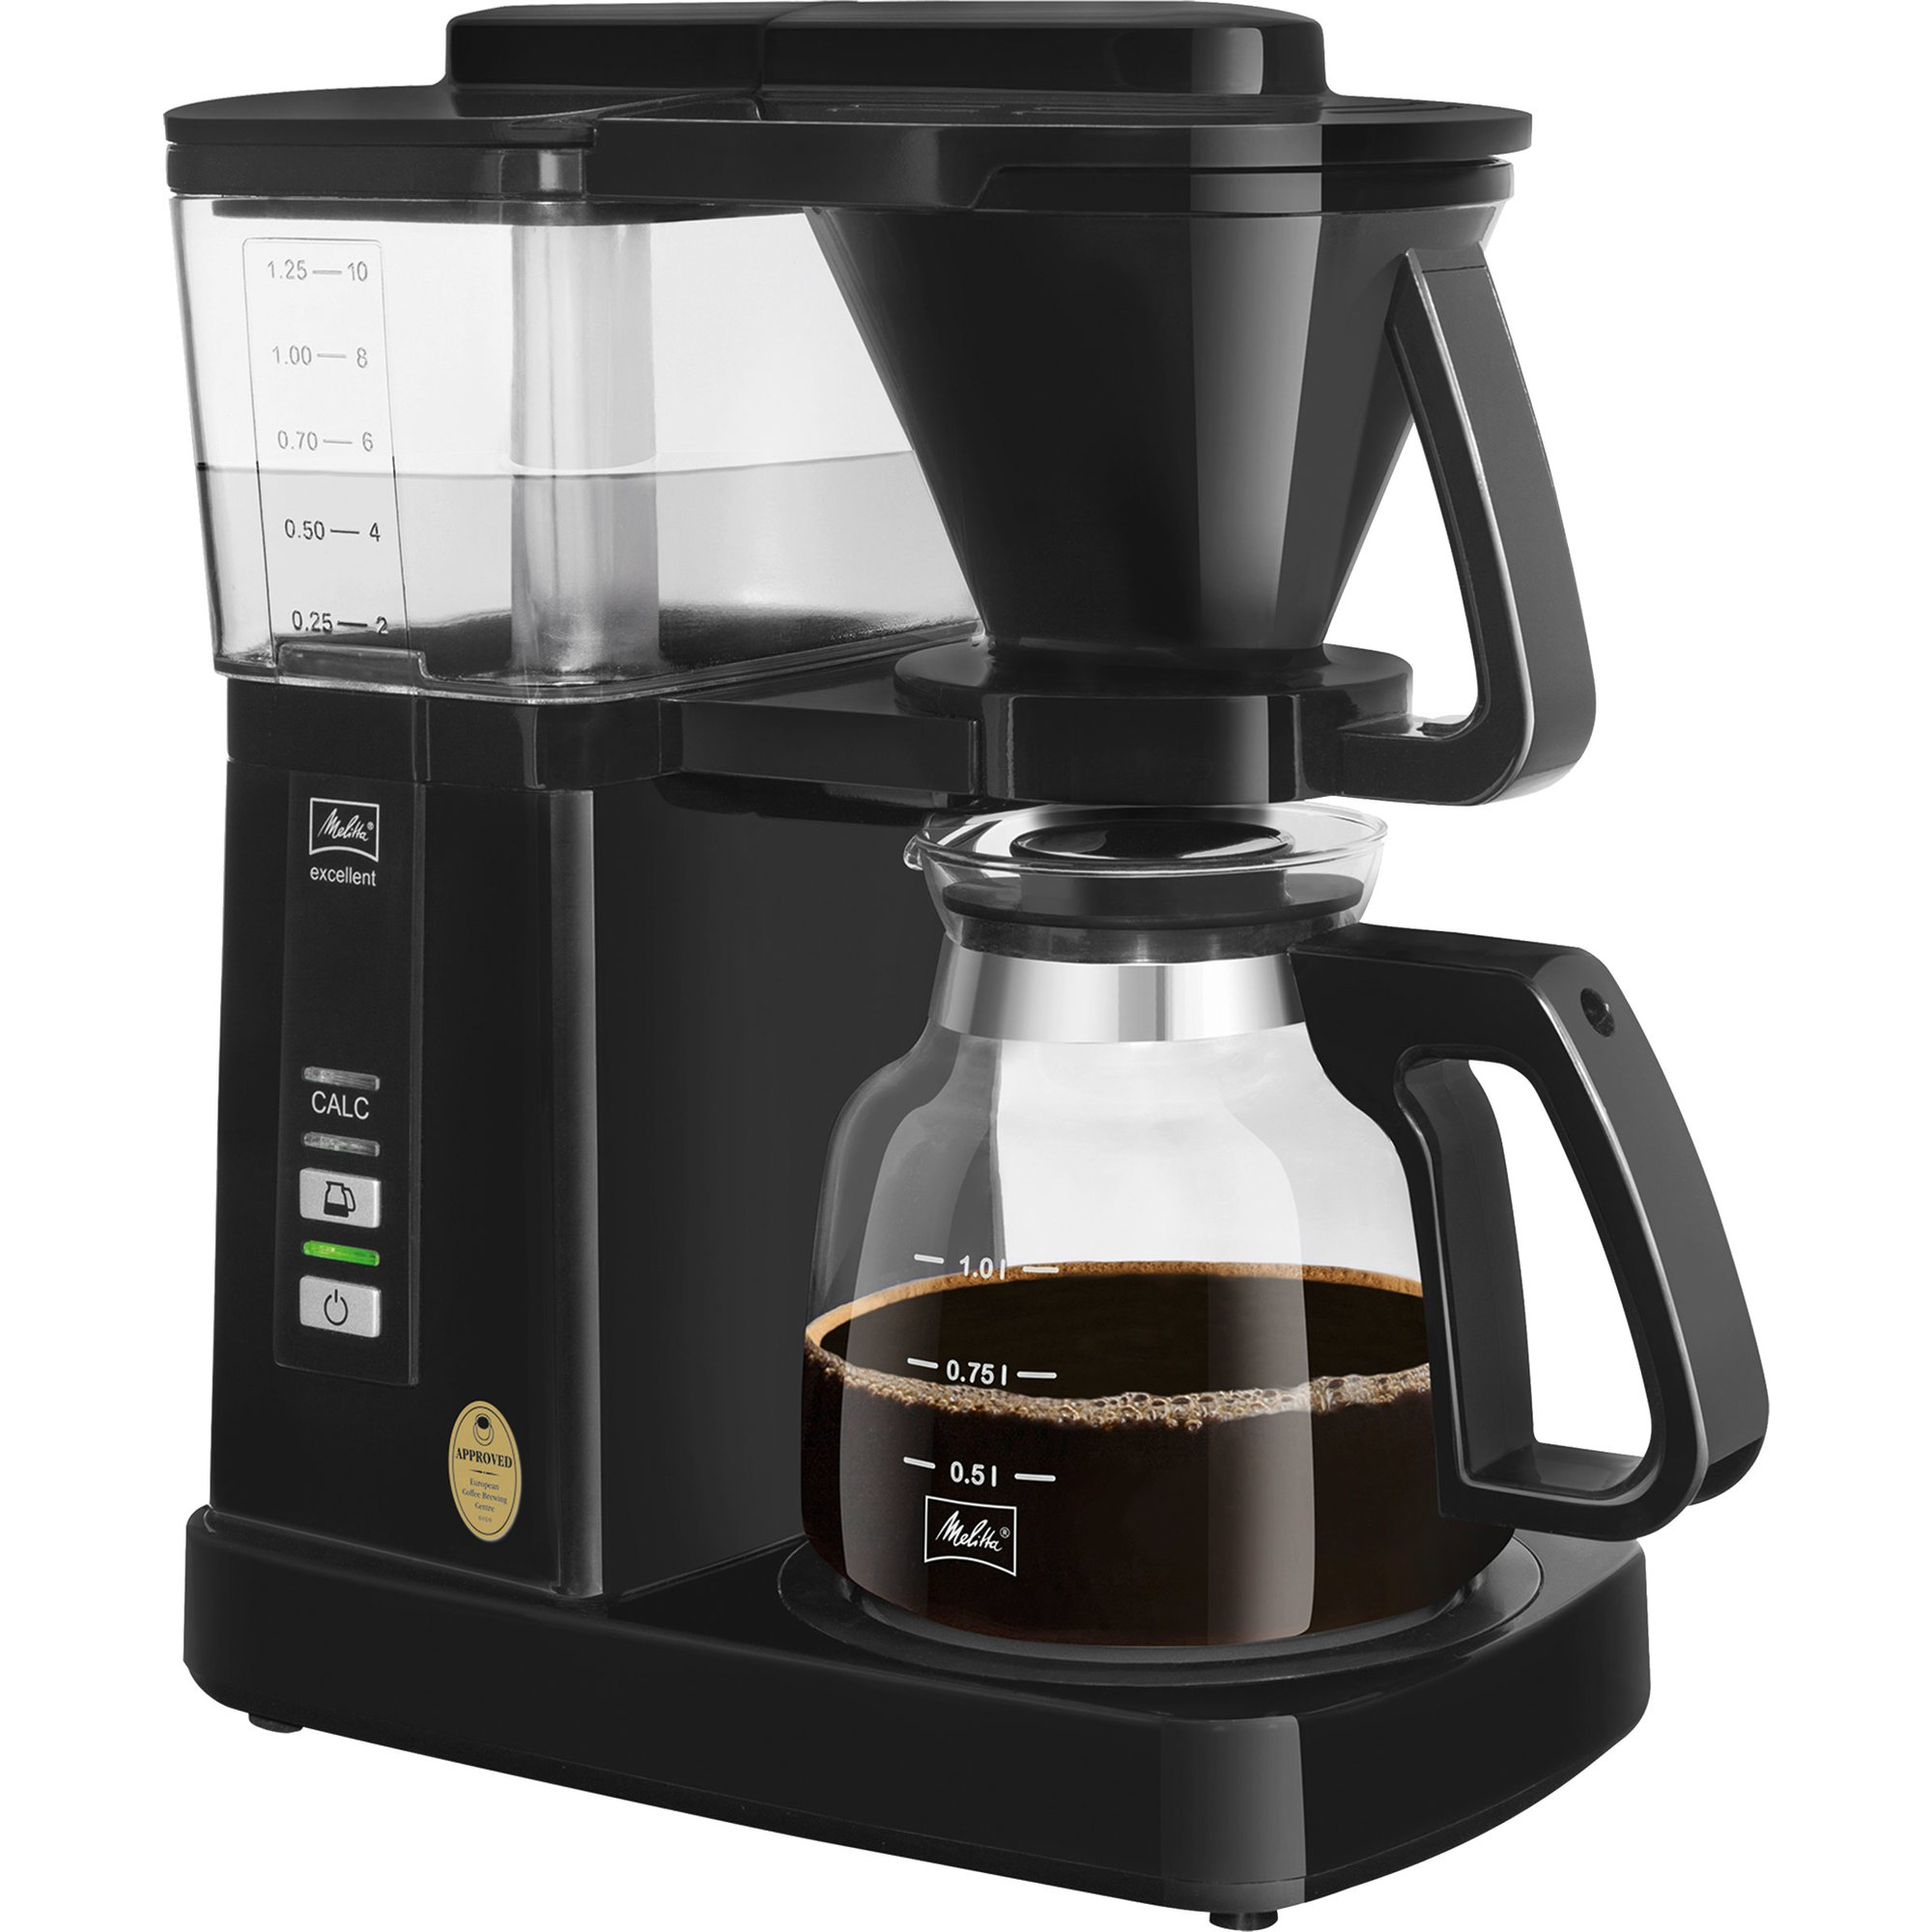 Melitta Excellent 5.0 kaffemaskine